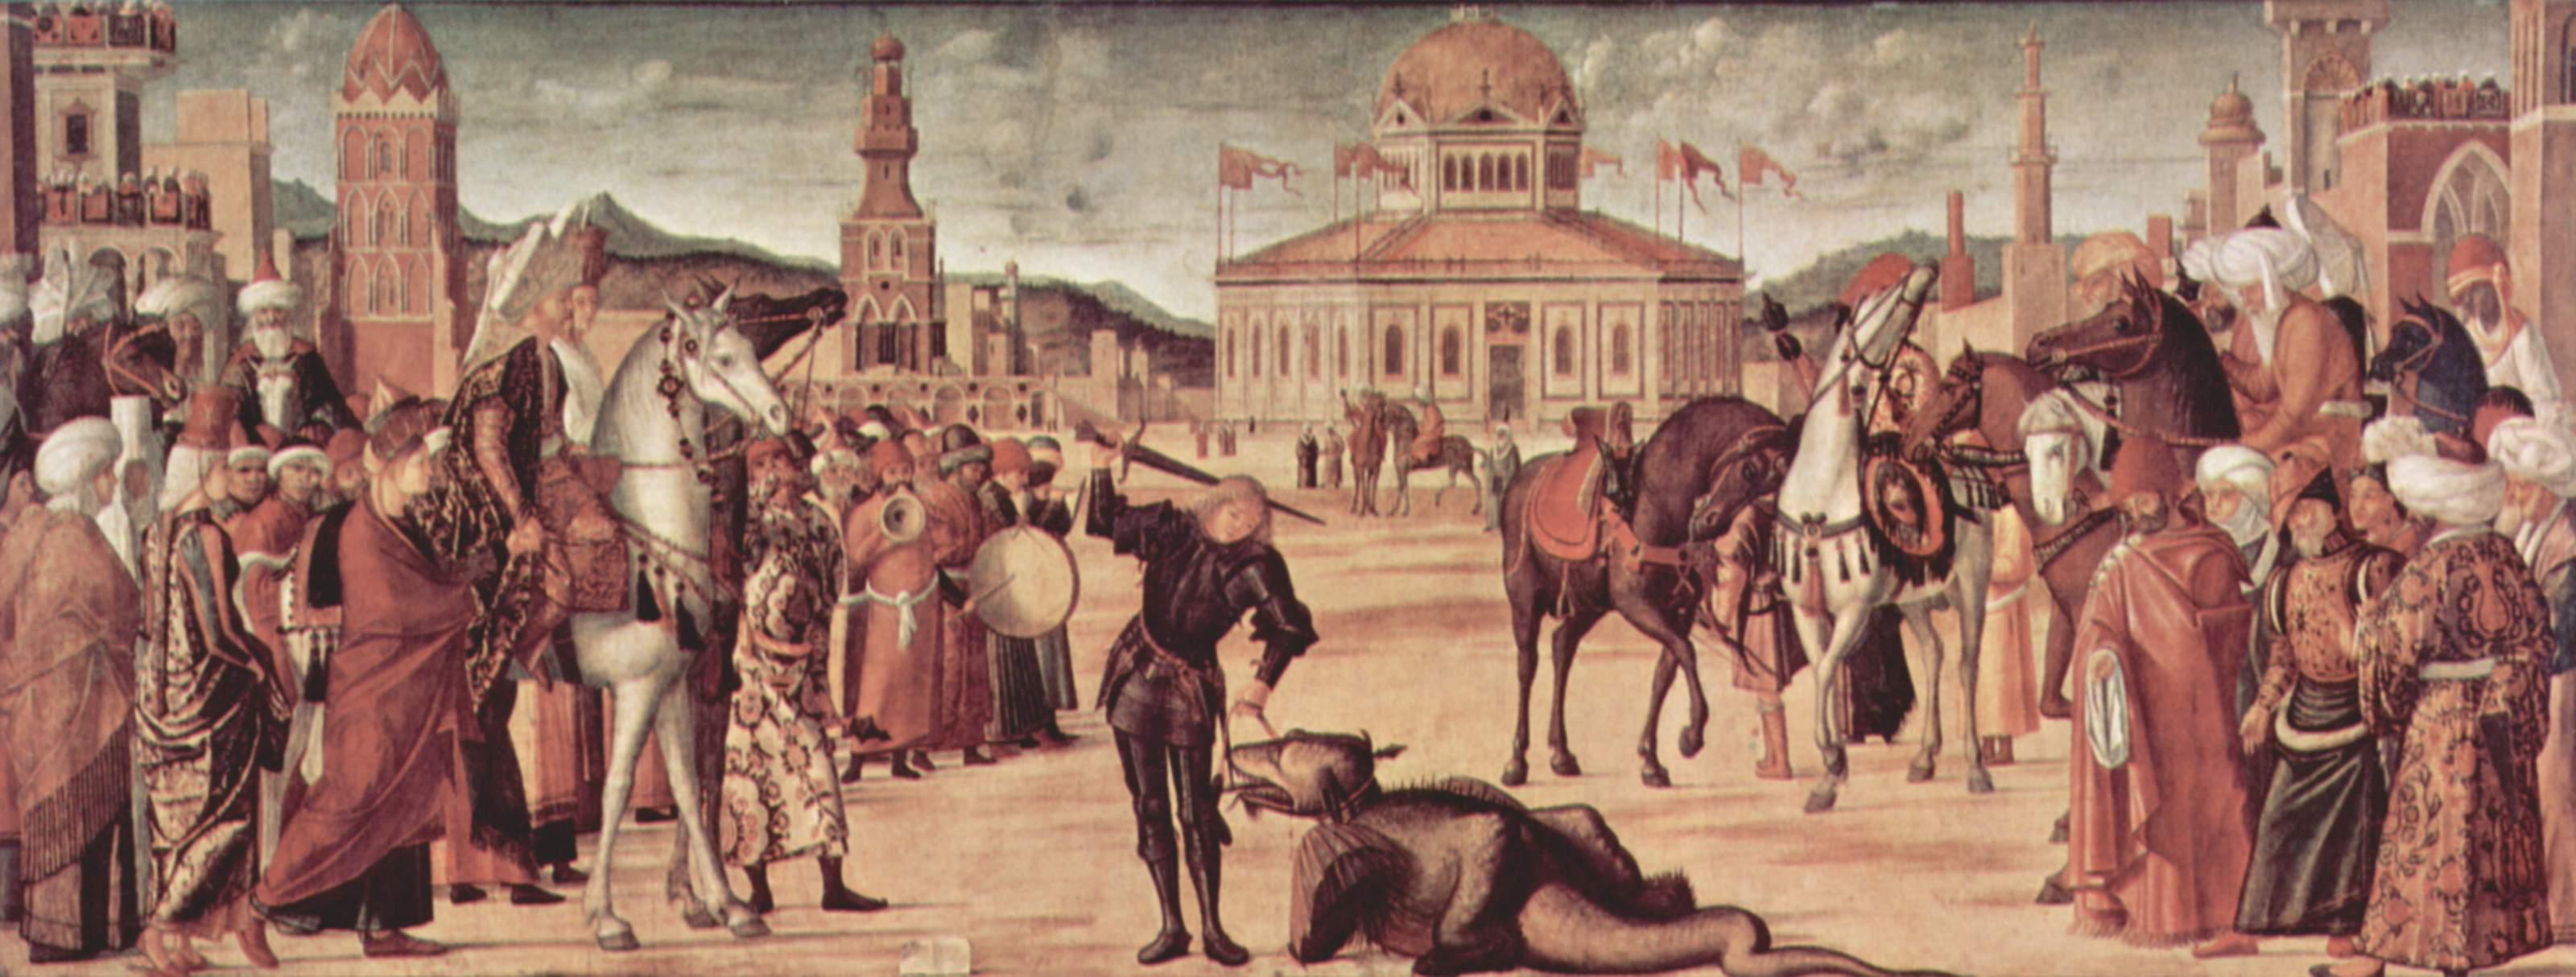 St. Mark Preaching in Alexandria, 1504 - 1507 - Giovanni Bellini -  WikiArt.org